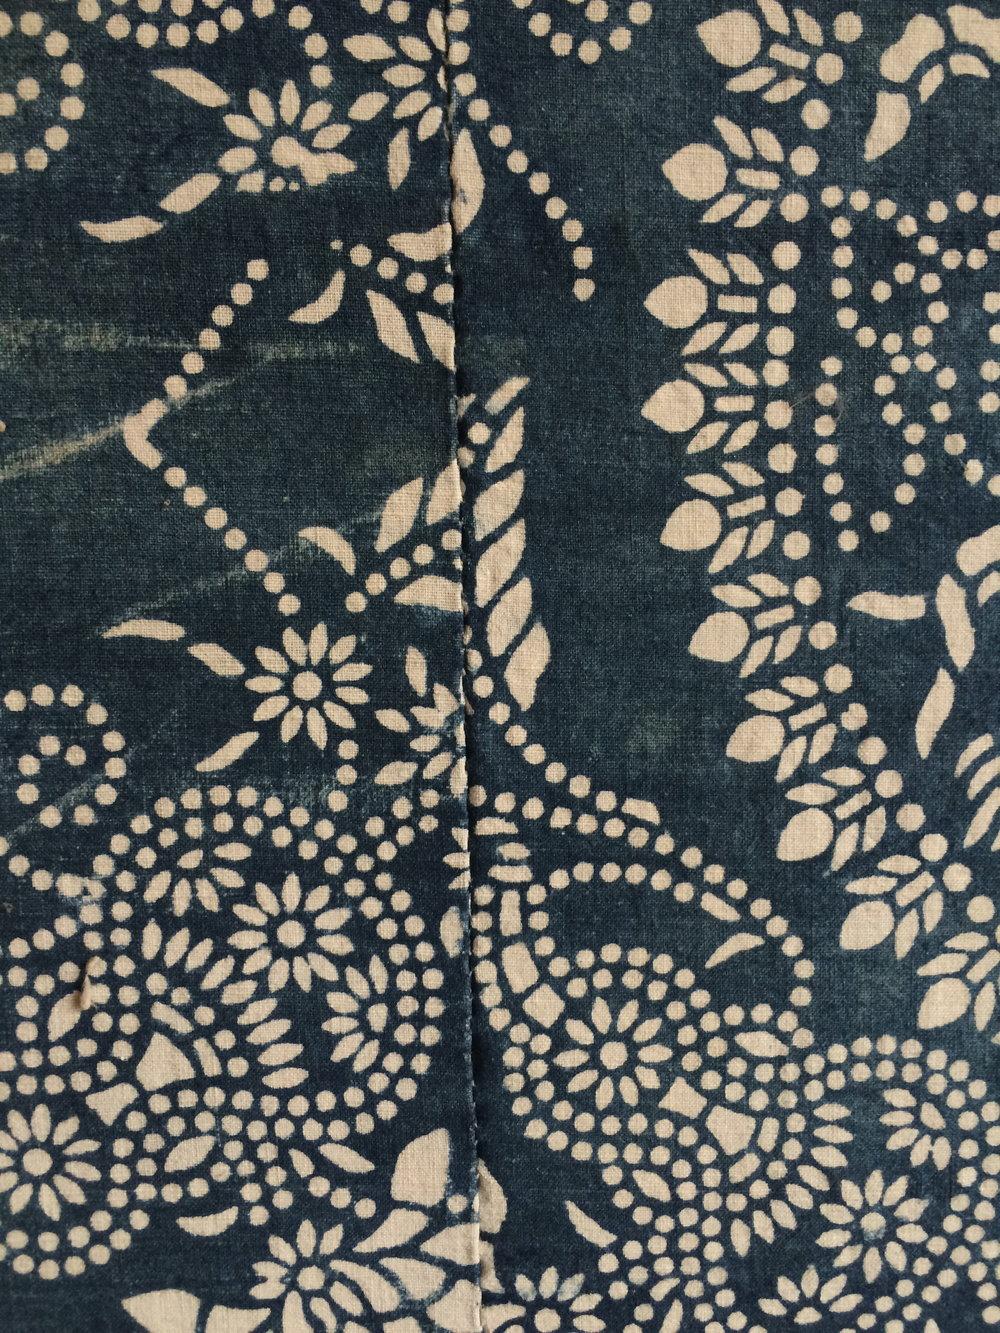 Nankeen printed textile